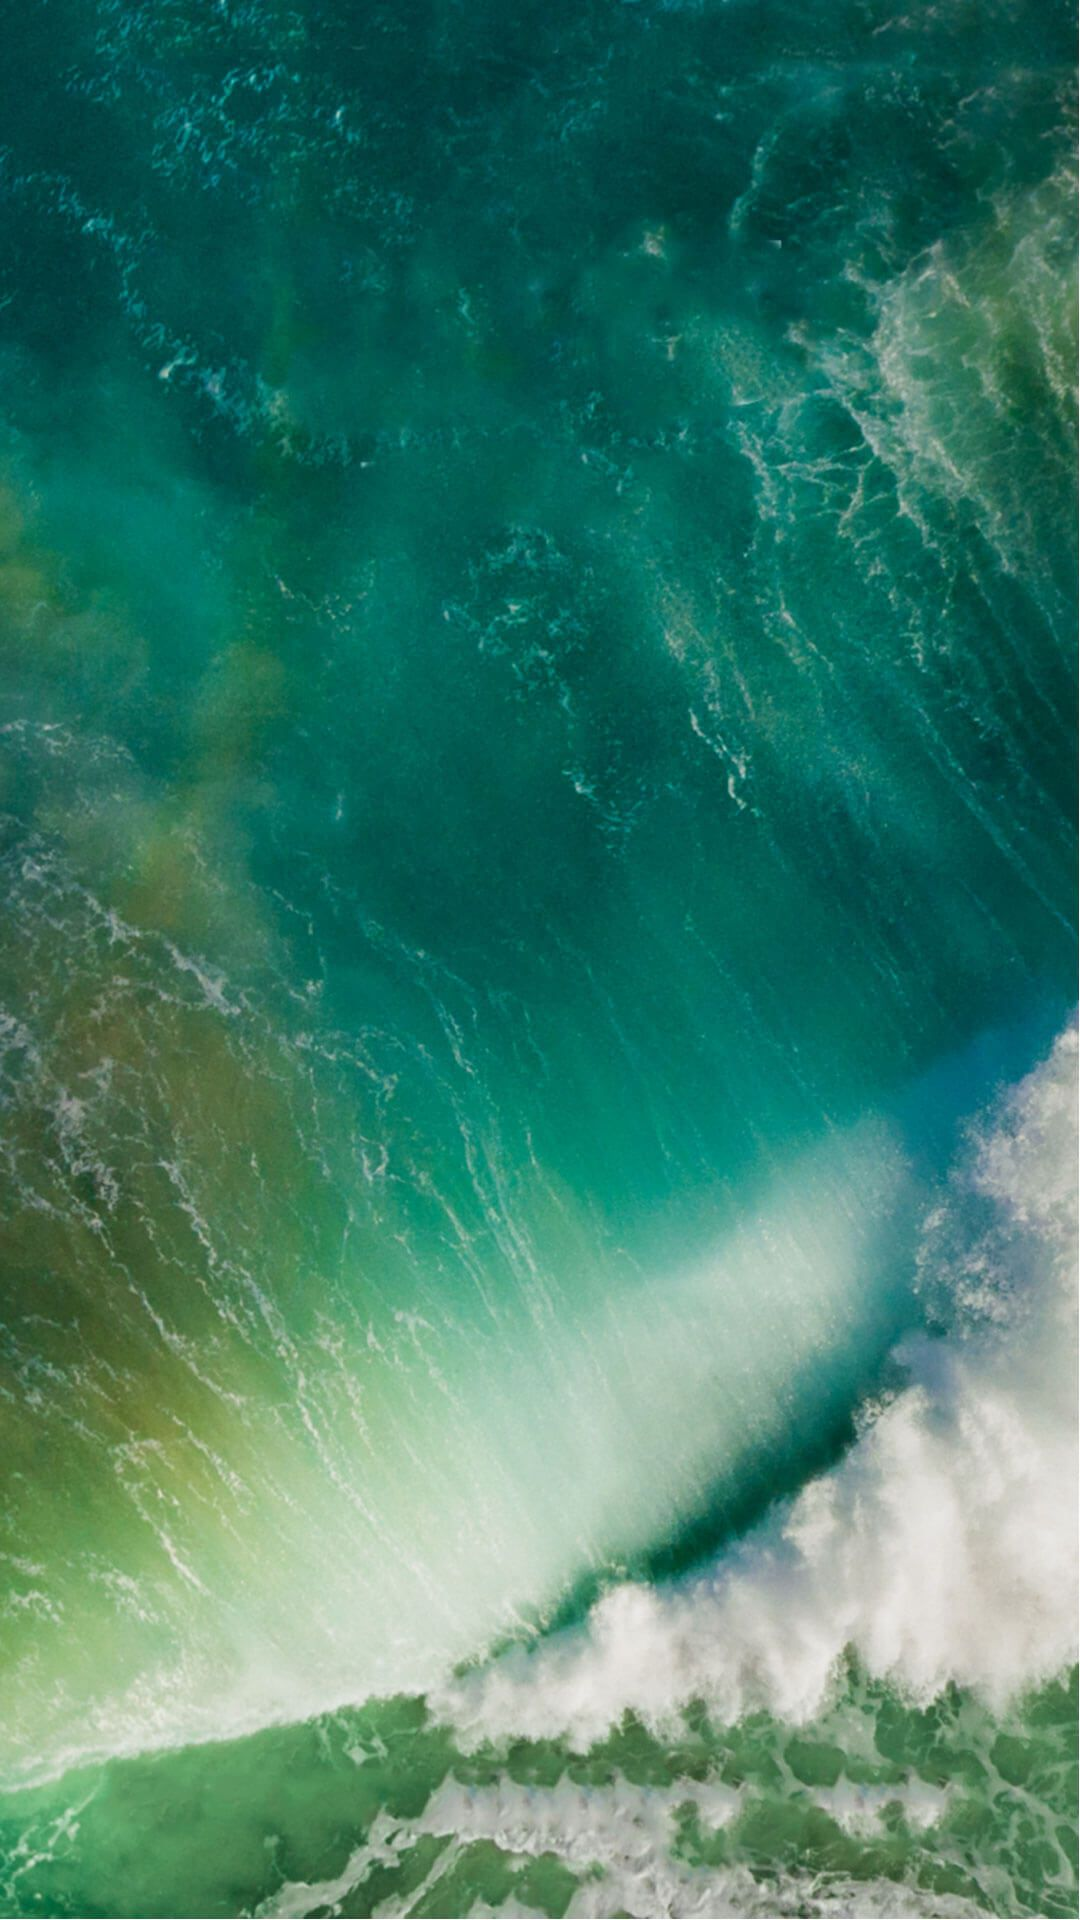 45 iPhone 7 Plus Wallpapers   Download at WallpaperBro 1080x1920